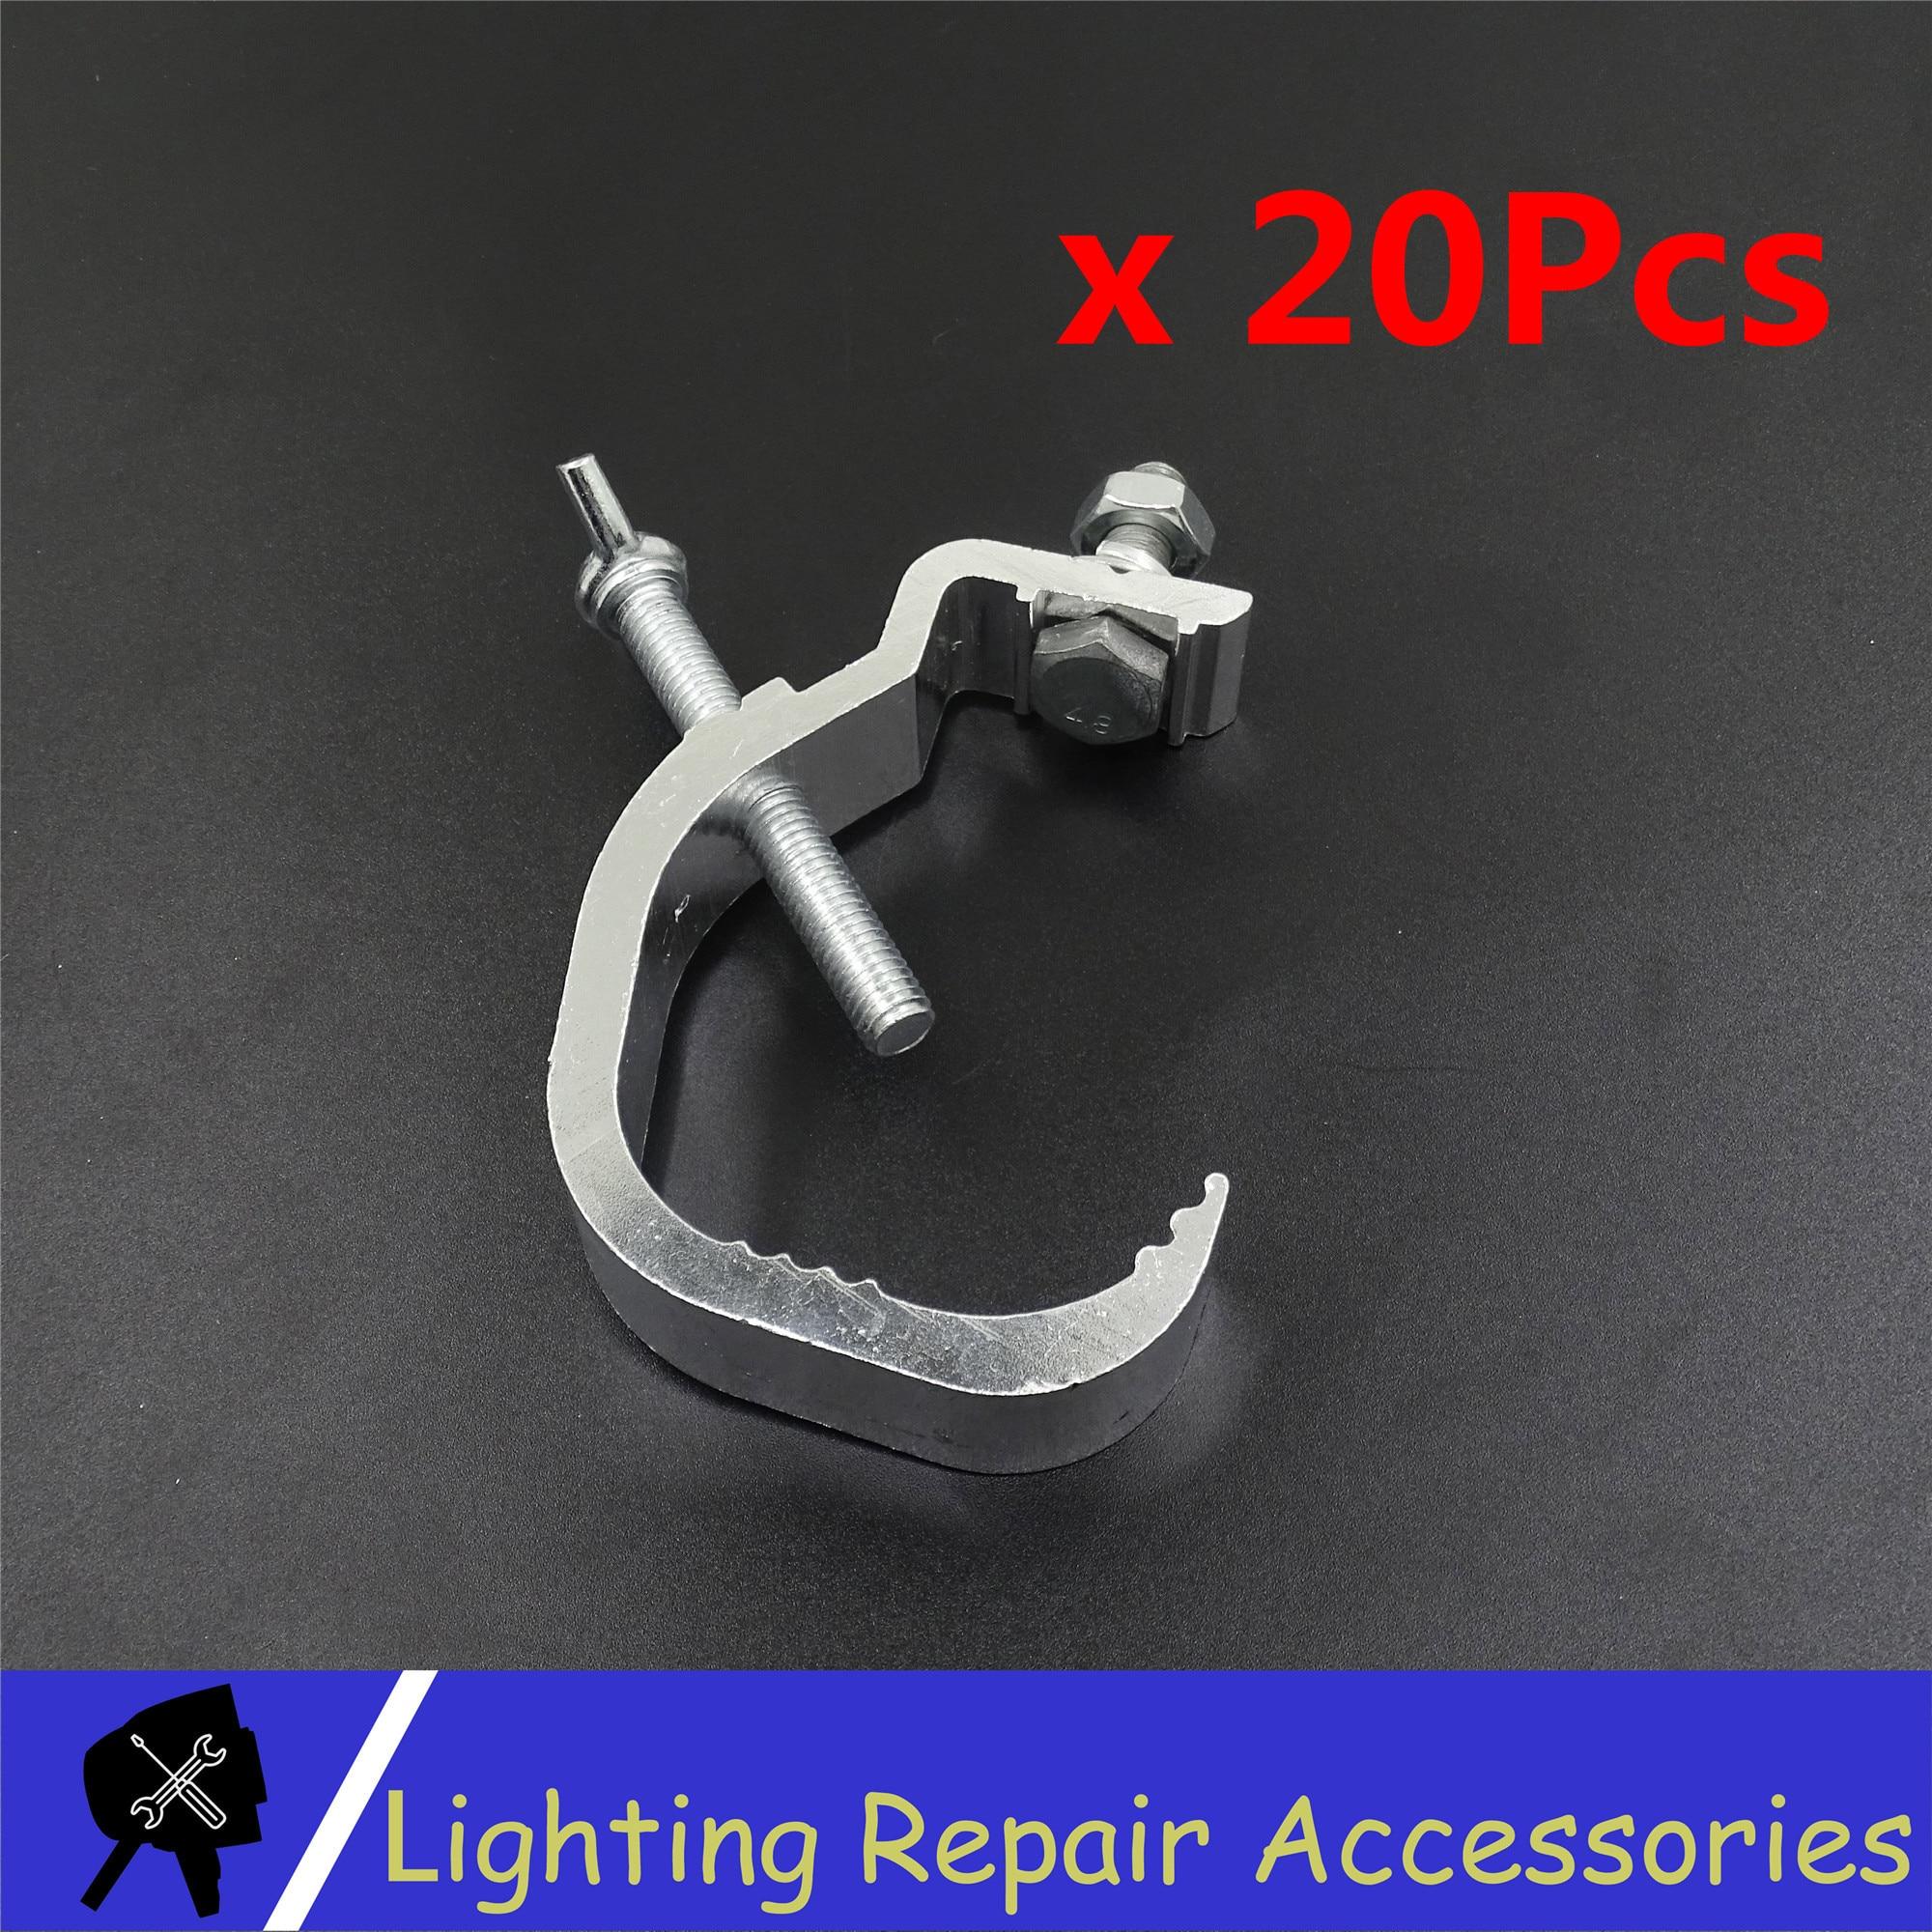 20Pcs/lots Par Light Hooks Aluminum Lights Hook 30-55mm Stage Equipment Led Stage Light Truss DJ Club Light Hanging Hook